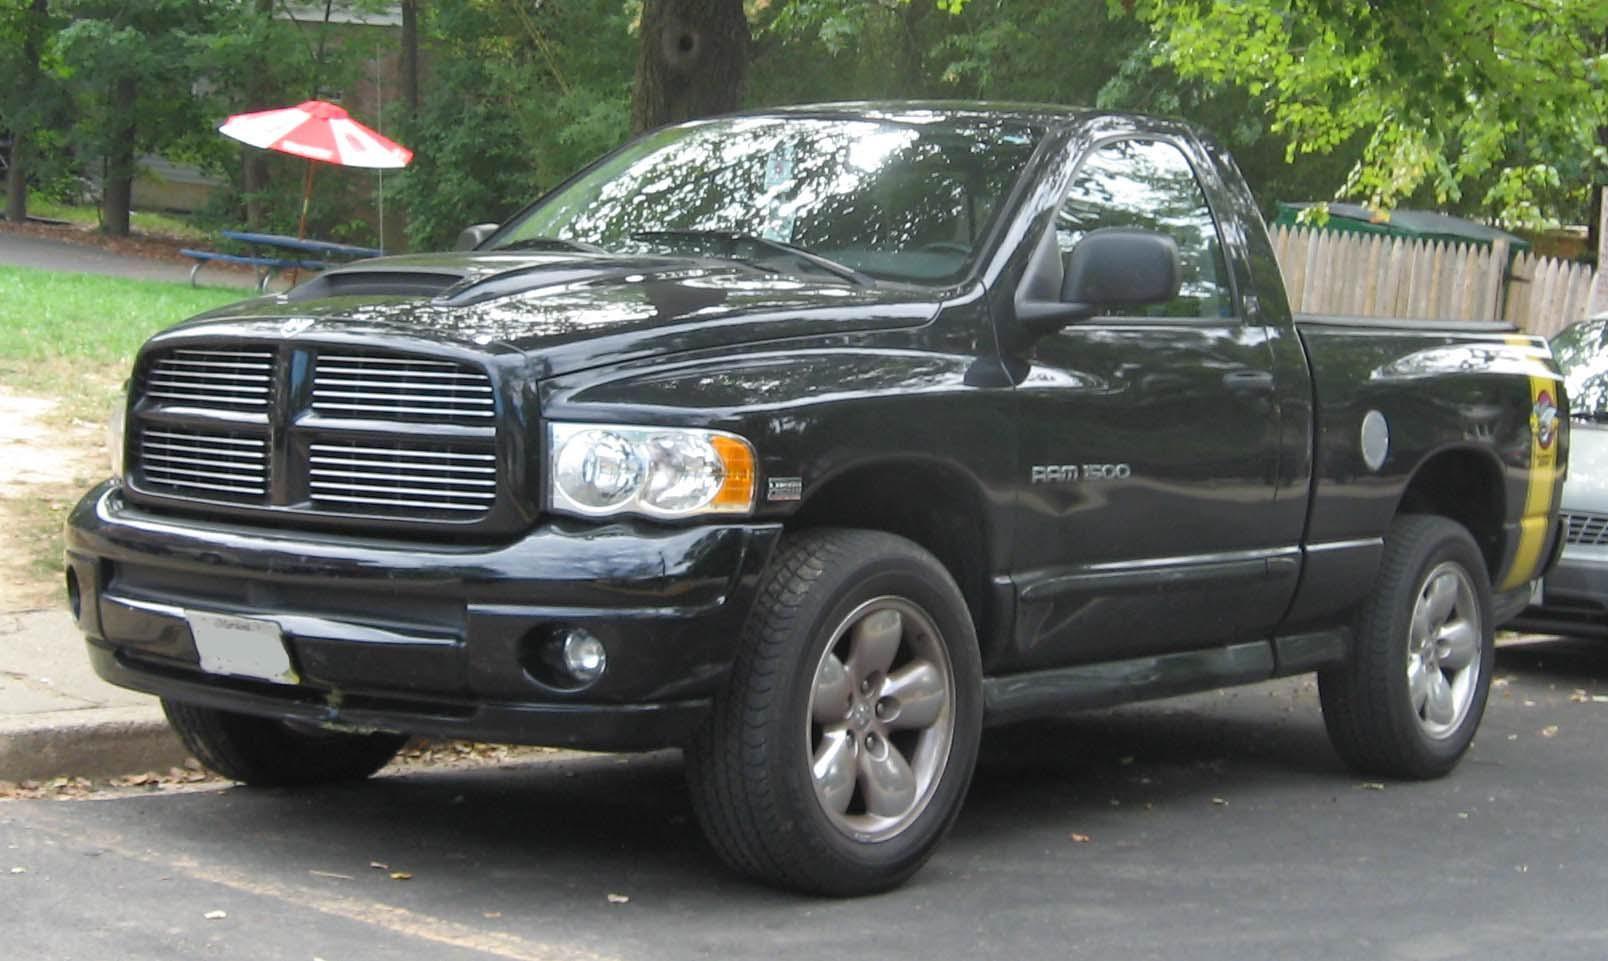 Dodge Ram 1500 Dodge ram, Dodge, Dodge ram 1500